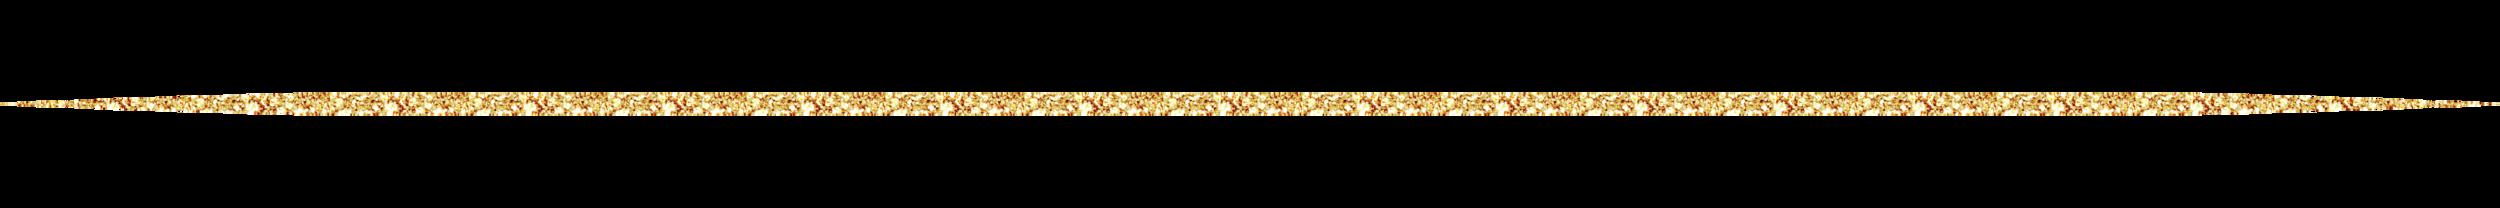 gold-line-borders-07_orig.png